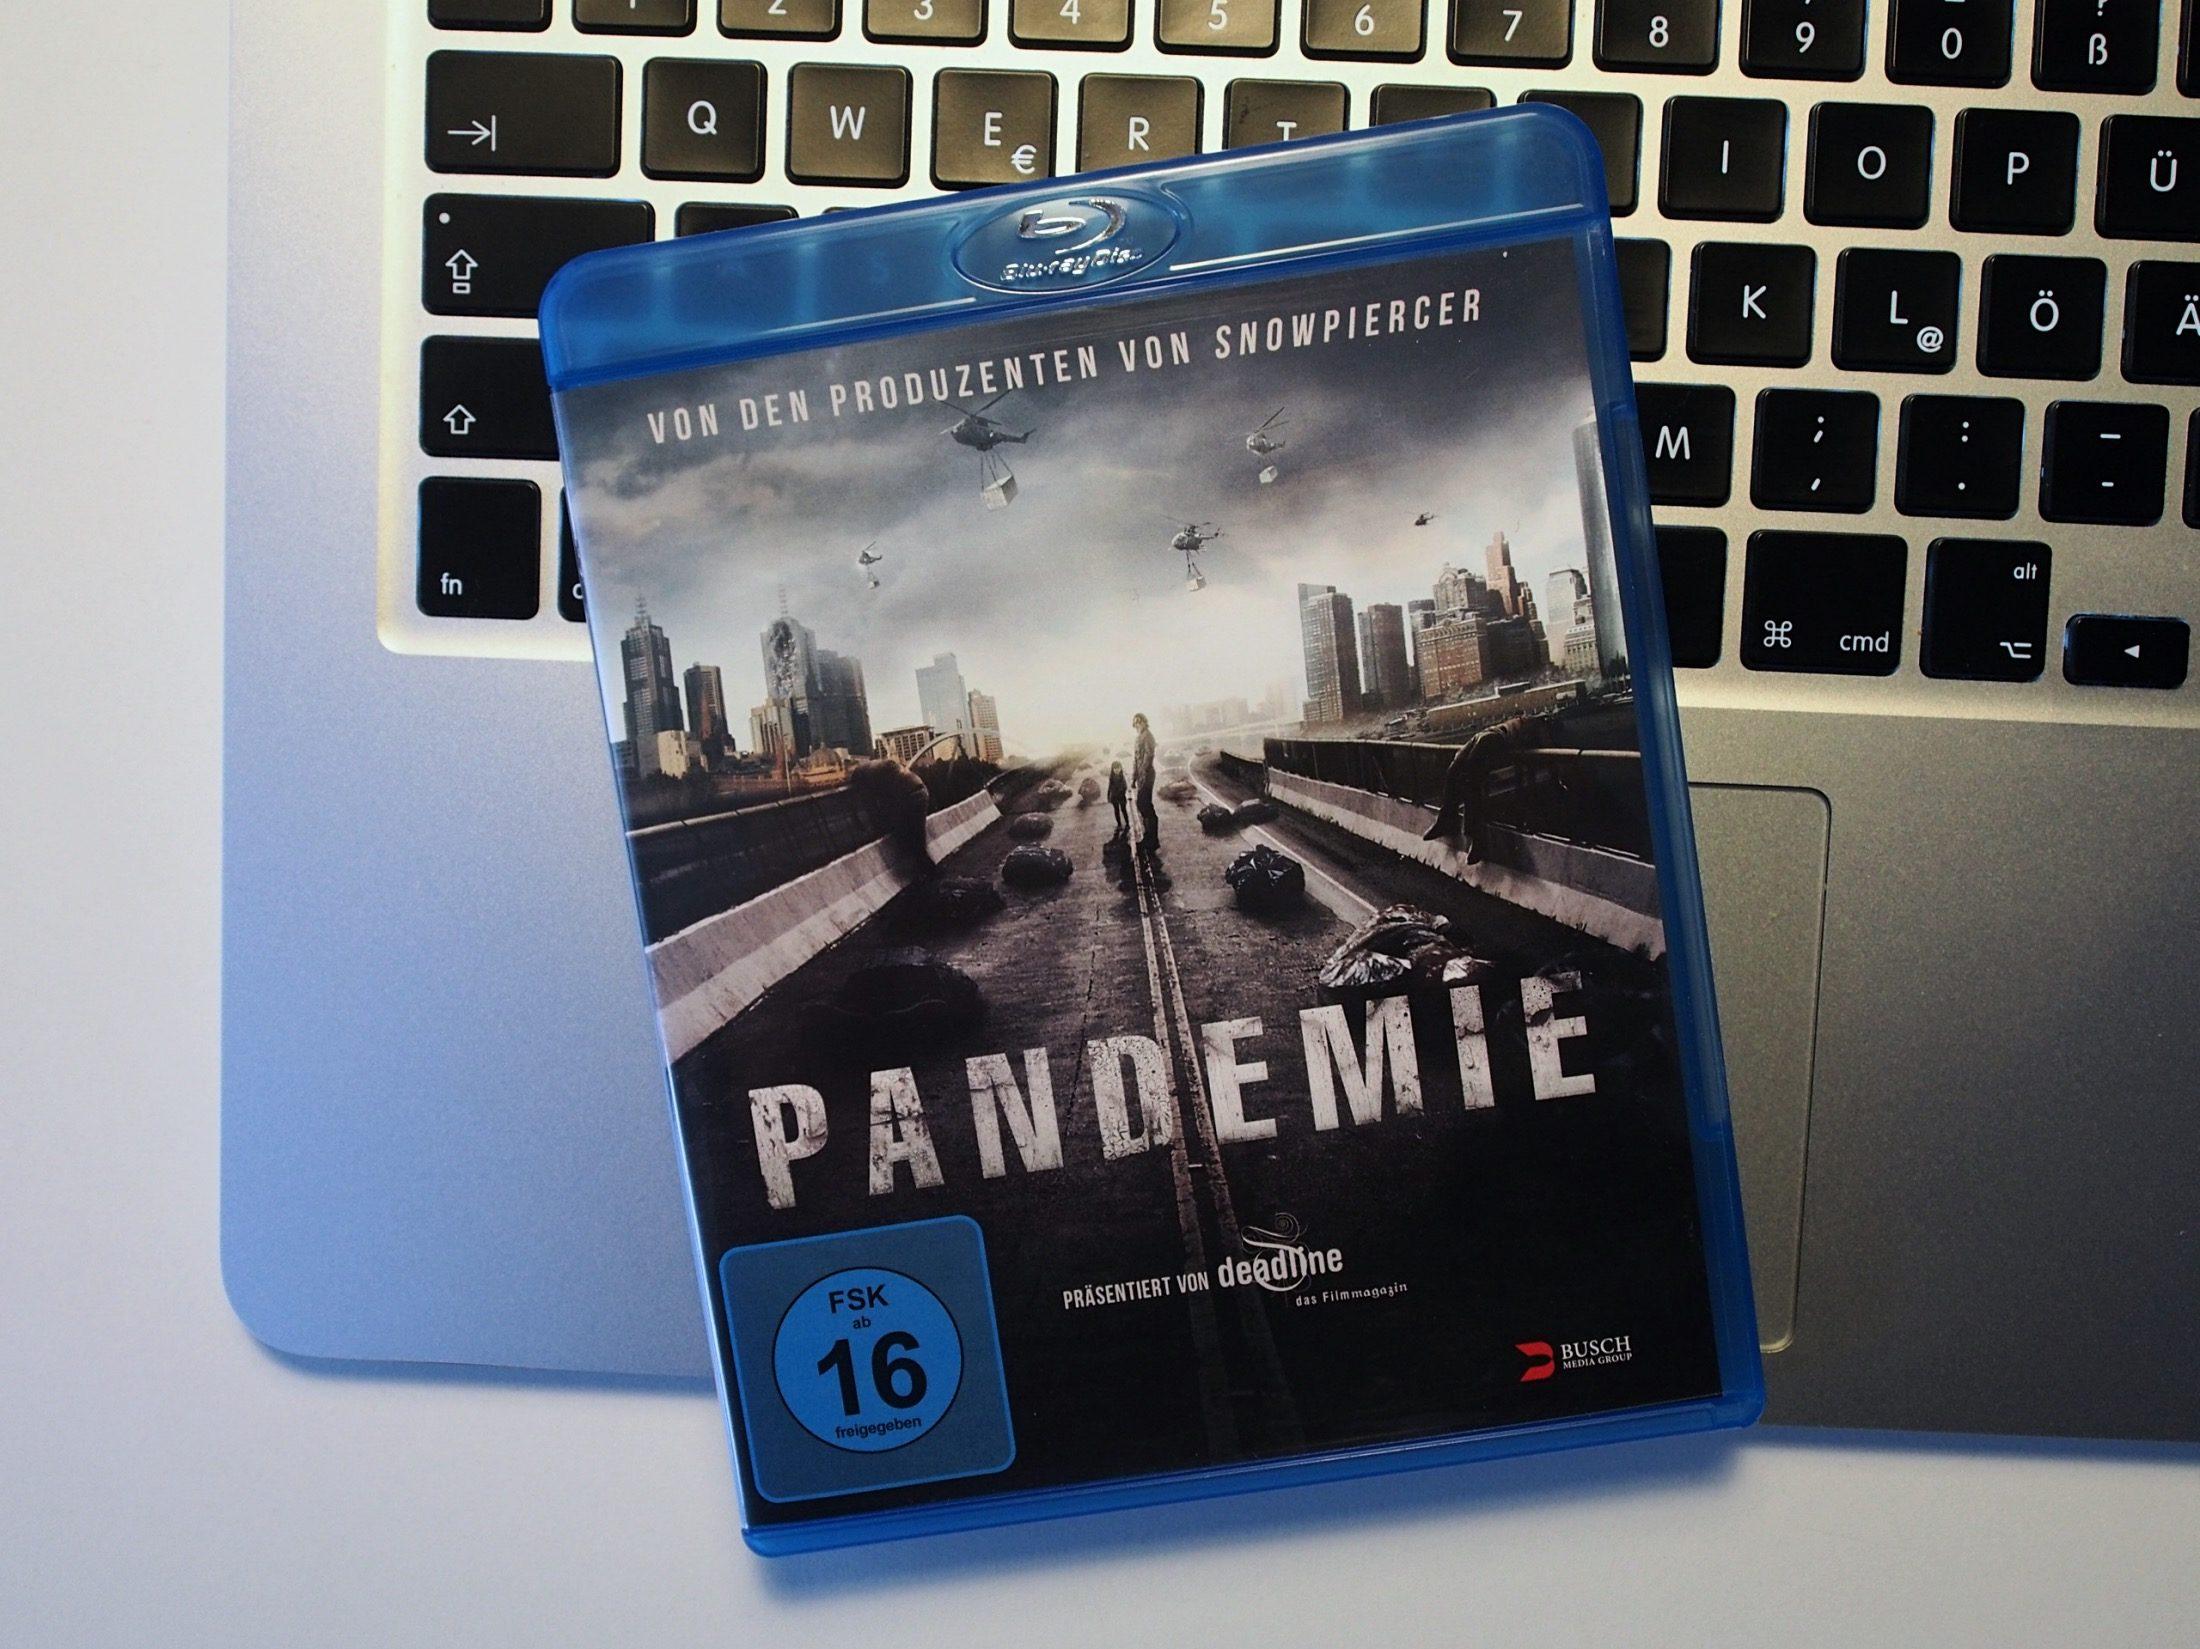 Reingeschaut Pandemie